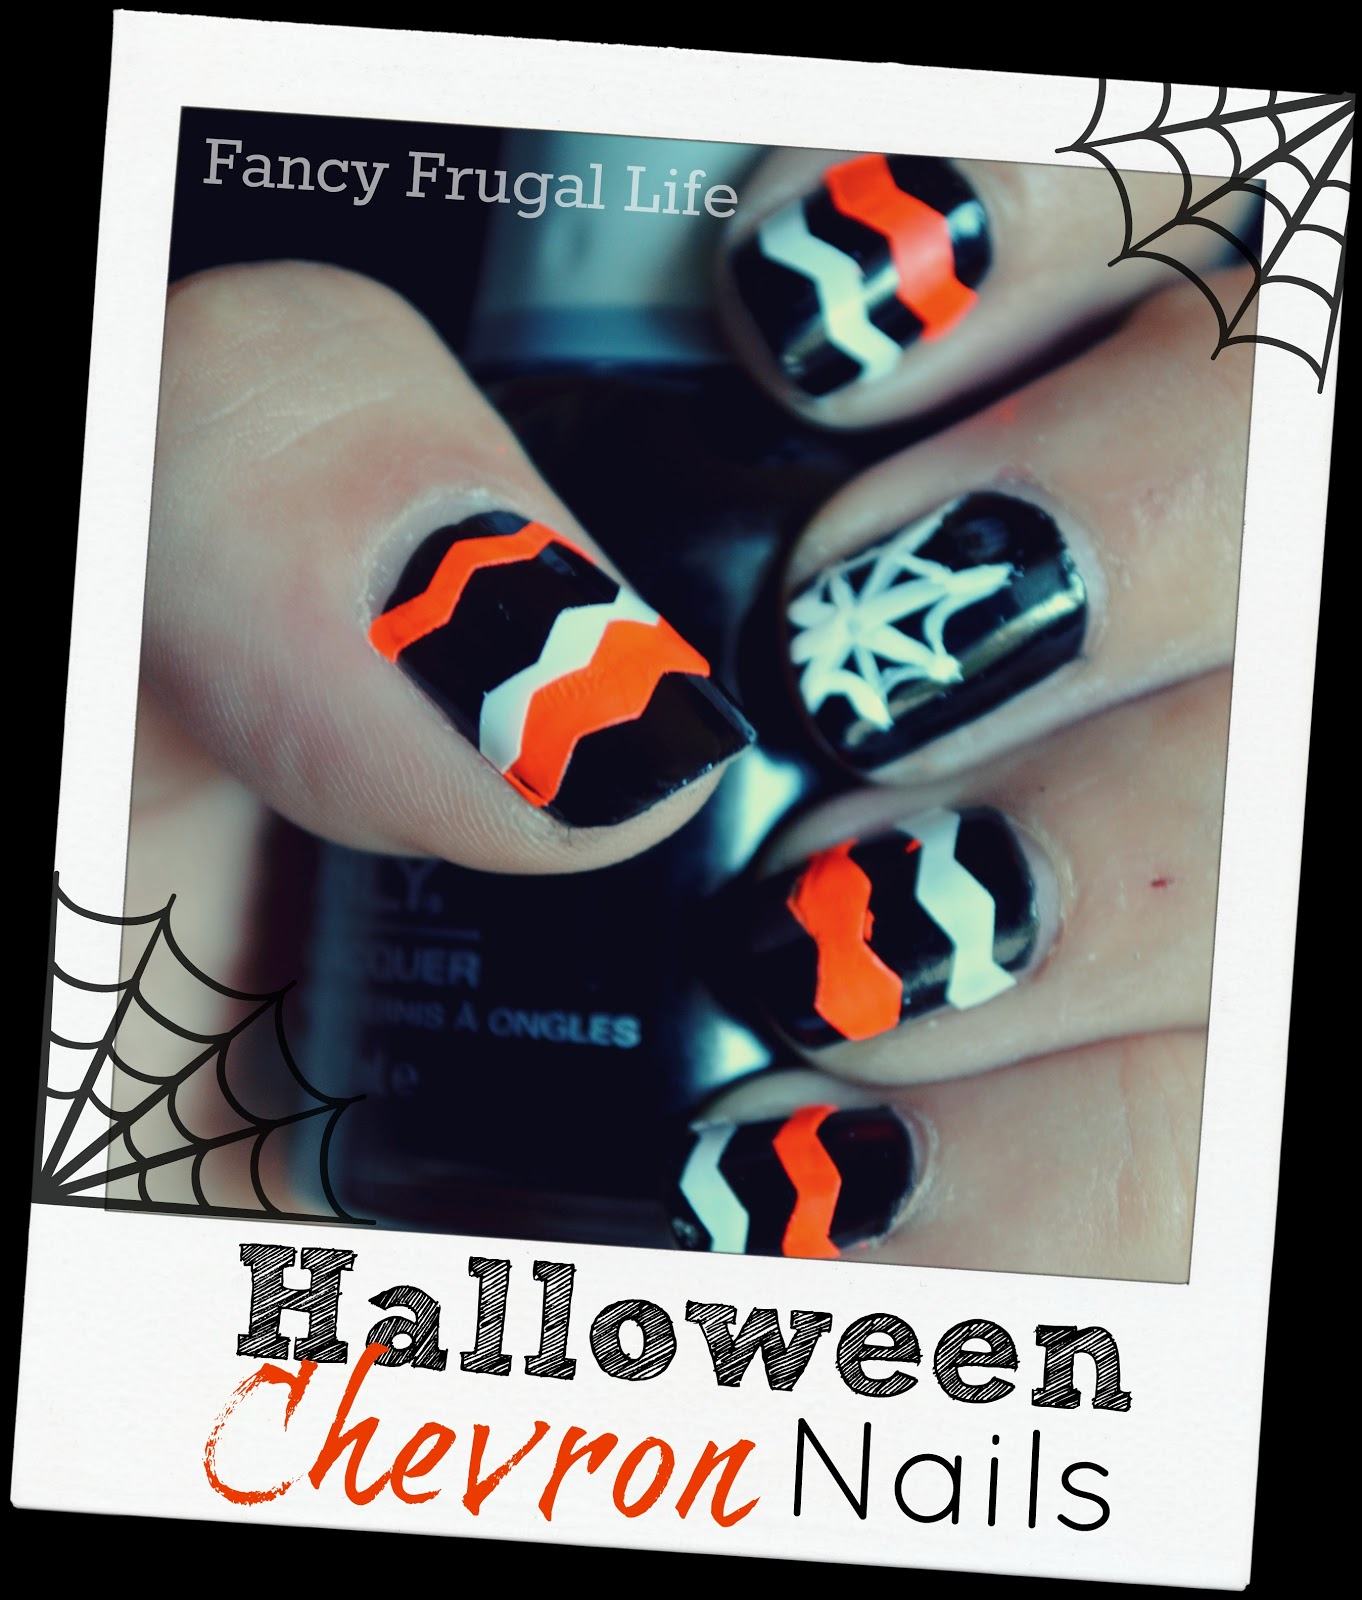 Diy halloween chevron nails easy halloween manicure diy halloween chevron nails easy halloween manicure solutioingenieria Image collections